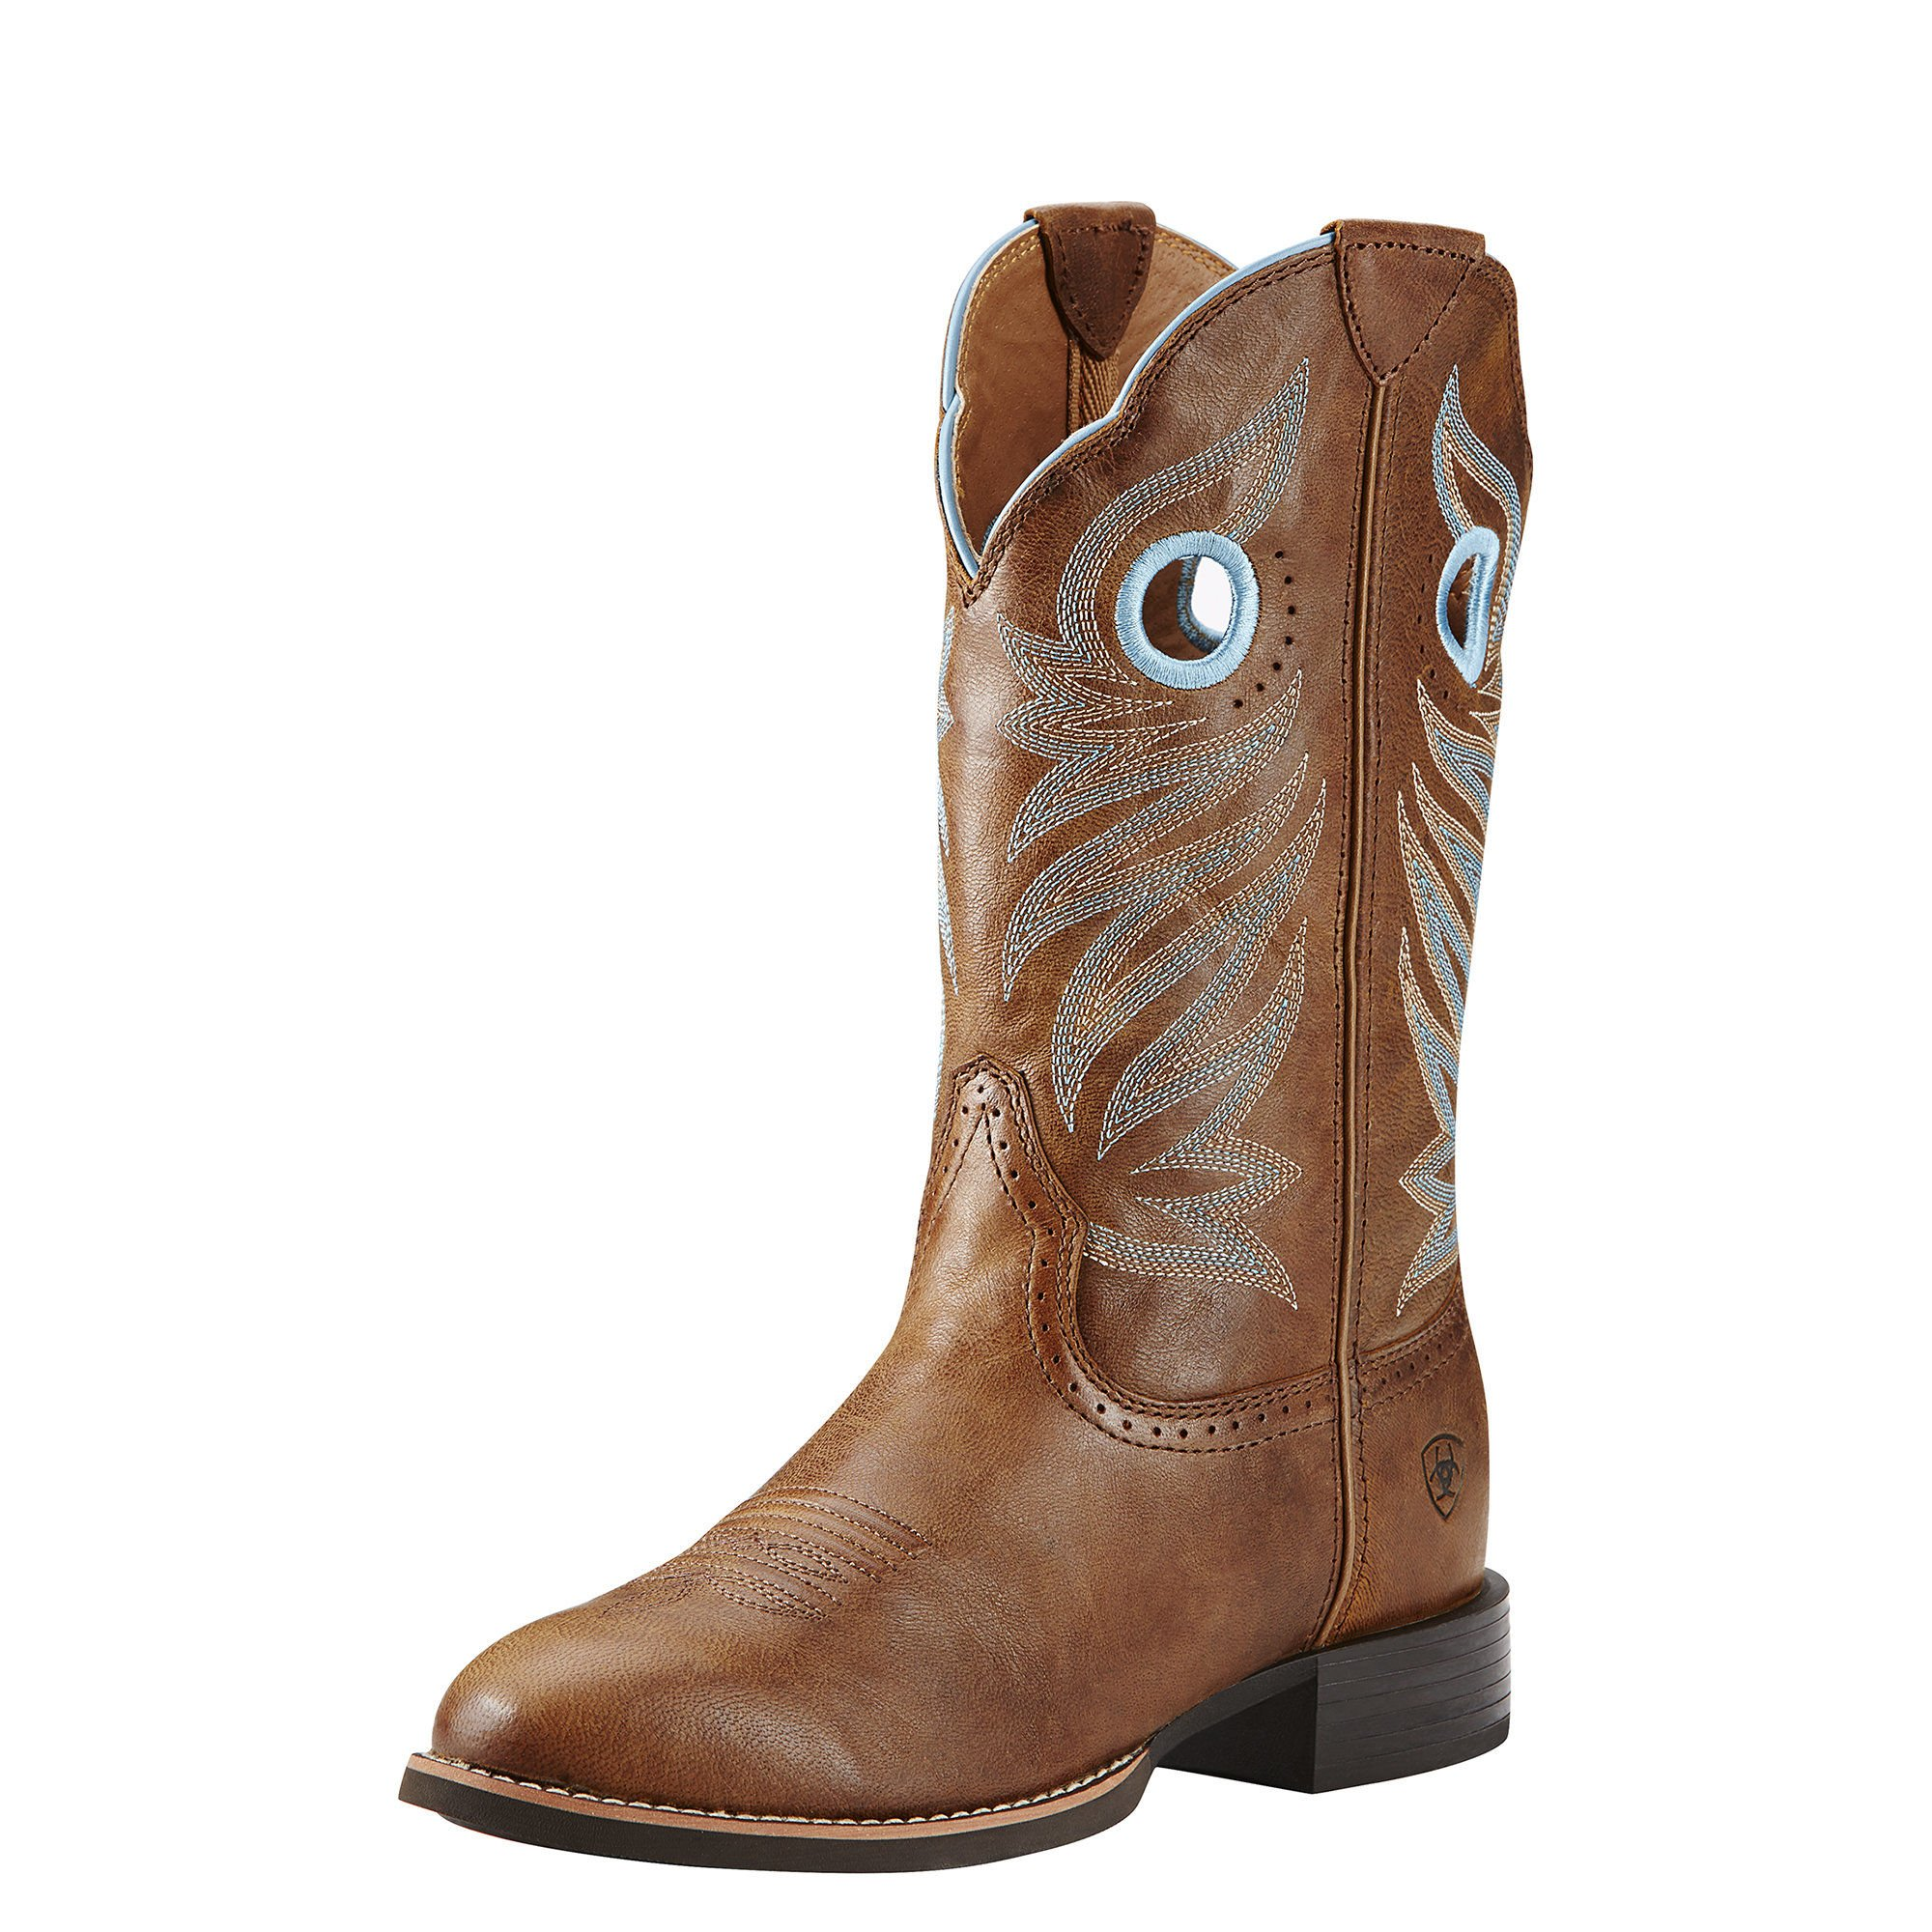 Ariat Women's Round Up Stockman Western Cowboy Boot, Wood, 6 B US